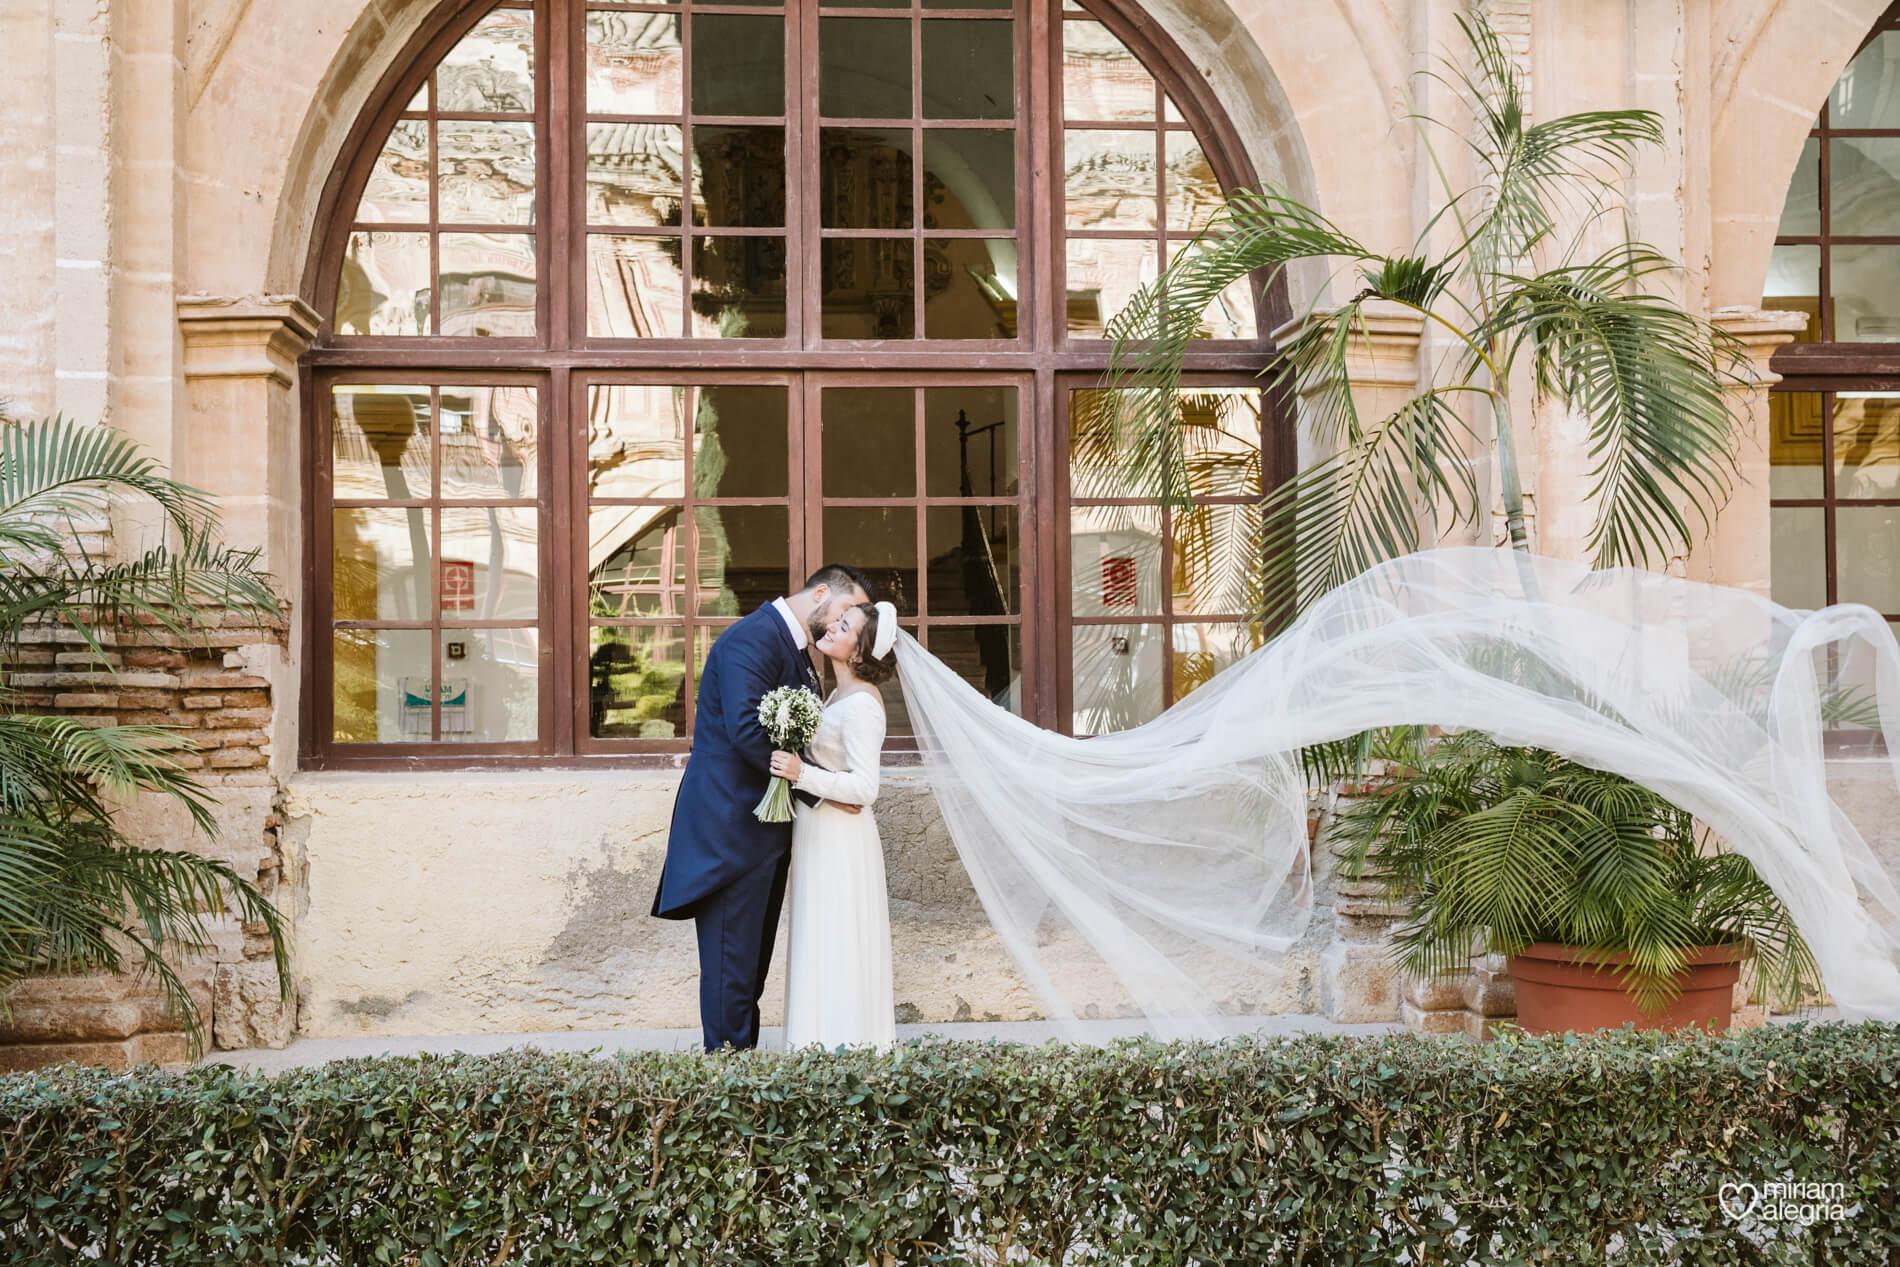 leoymarcos-una-novia-velada-133